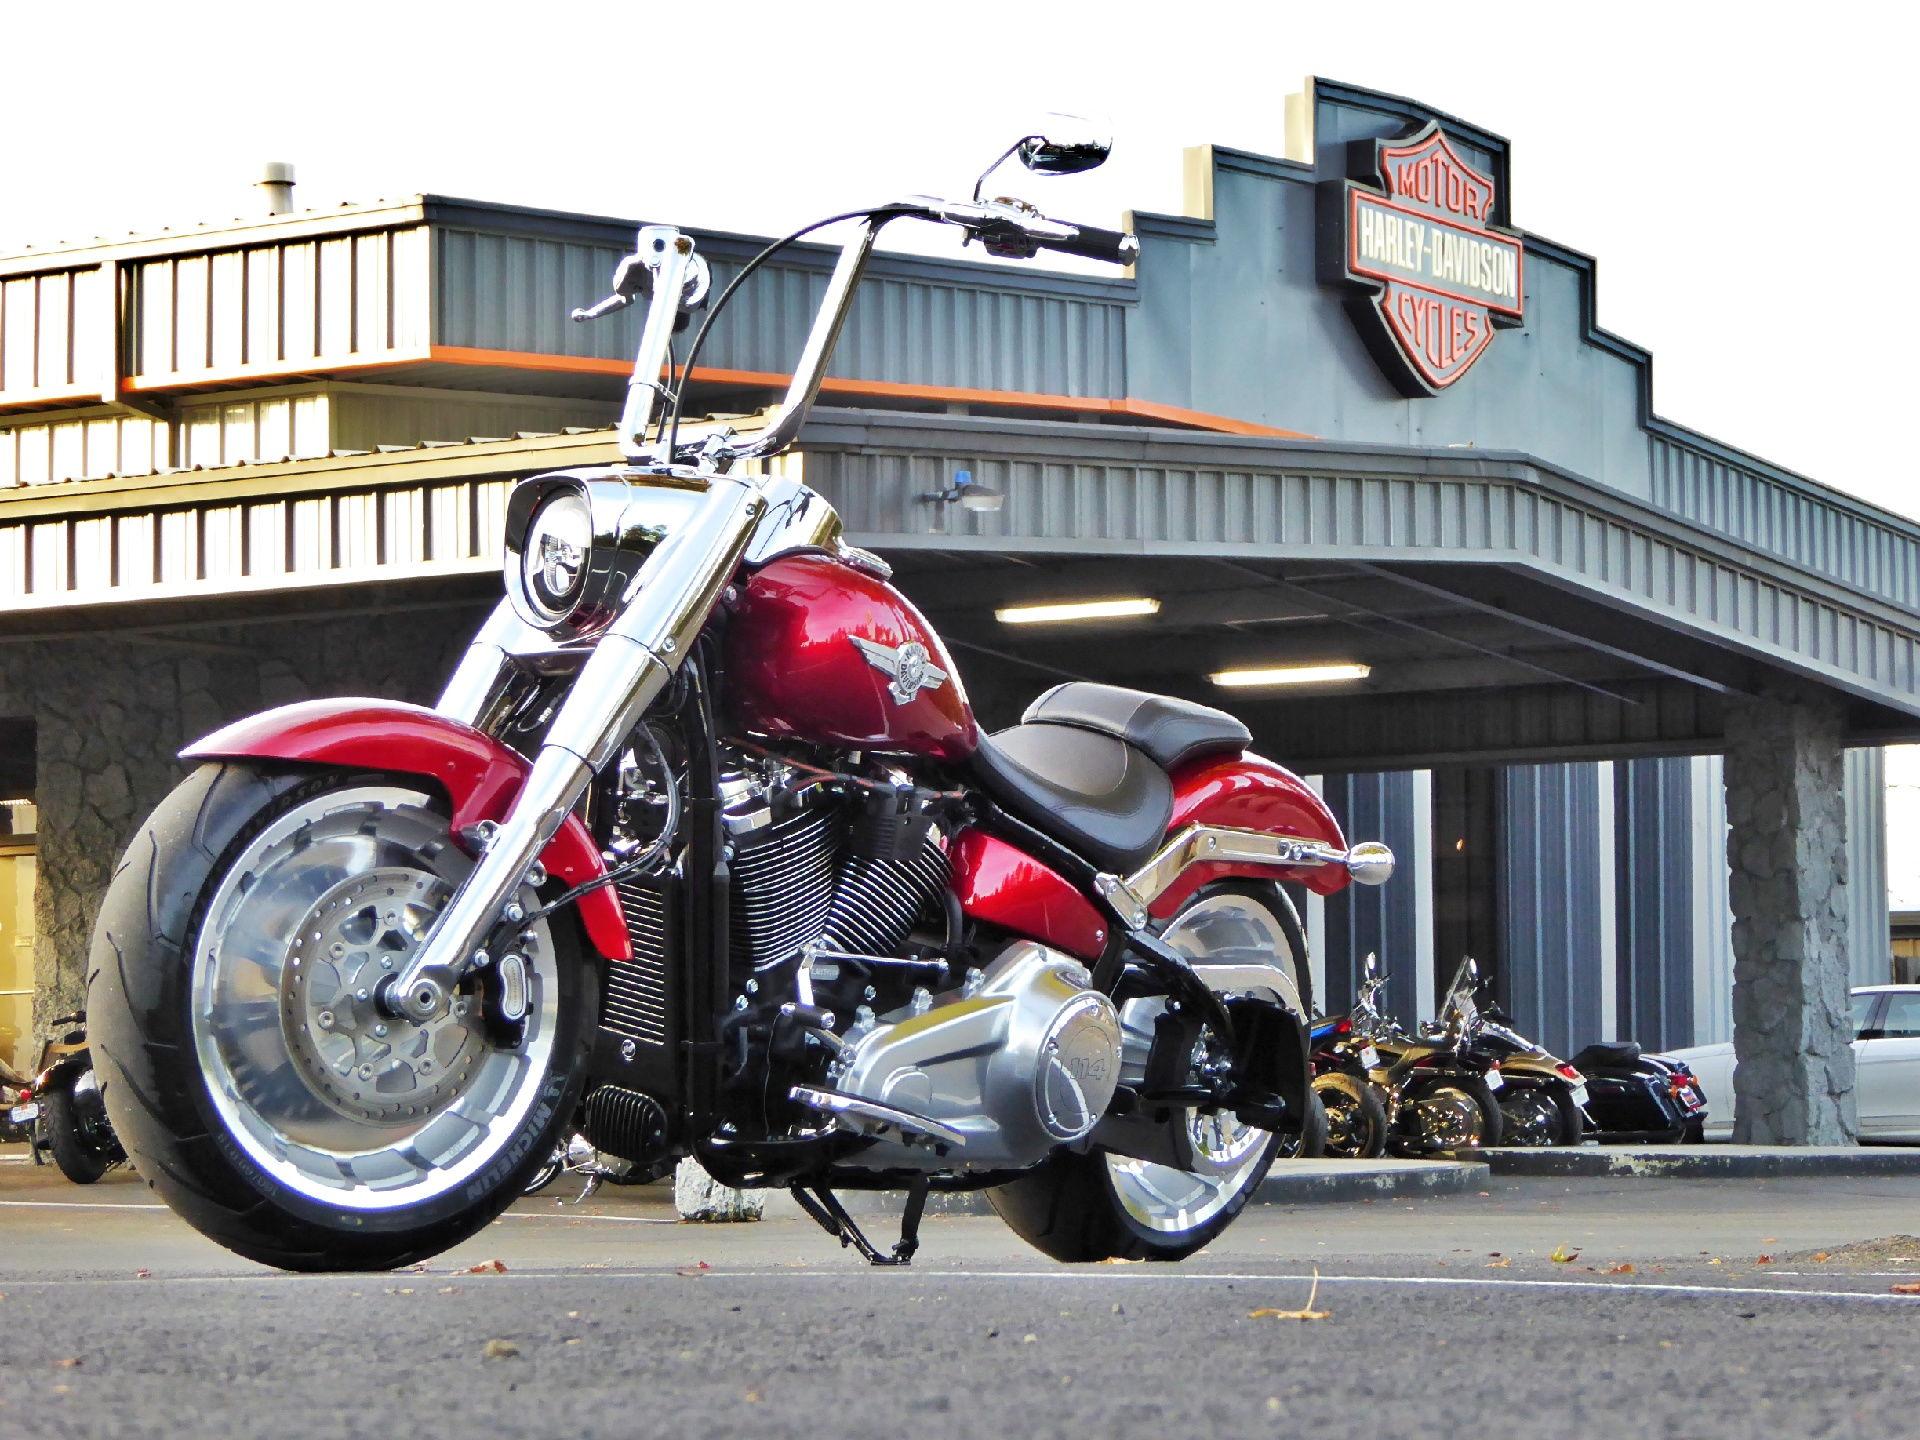 Forum Harley Davidson Fat Boy S